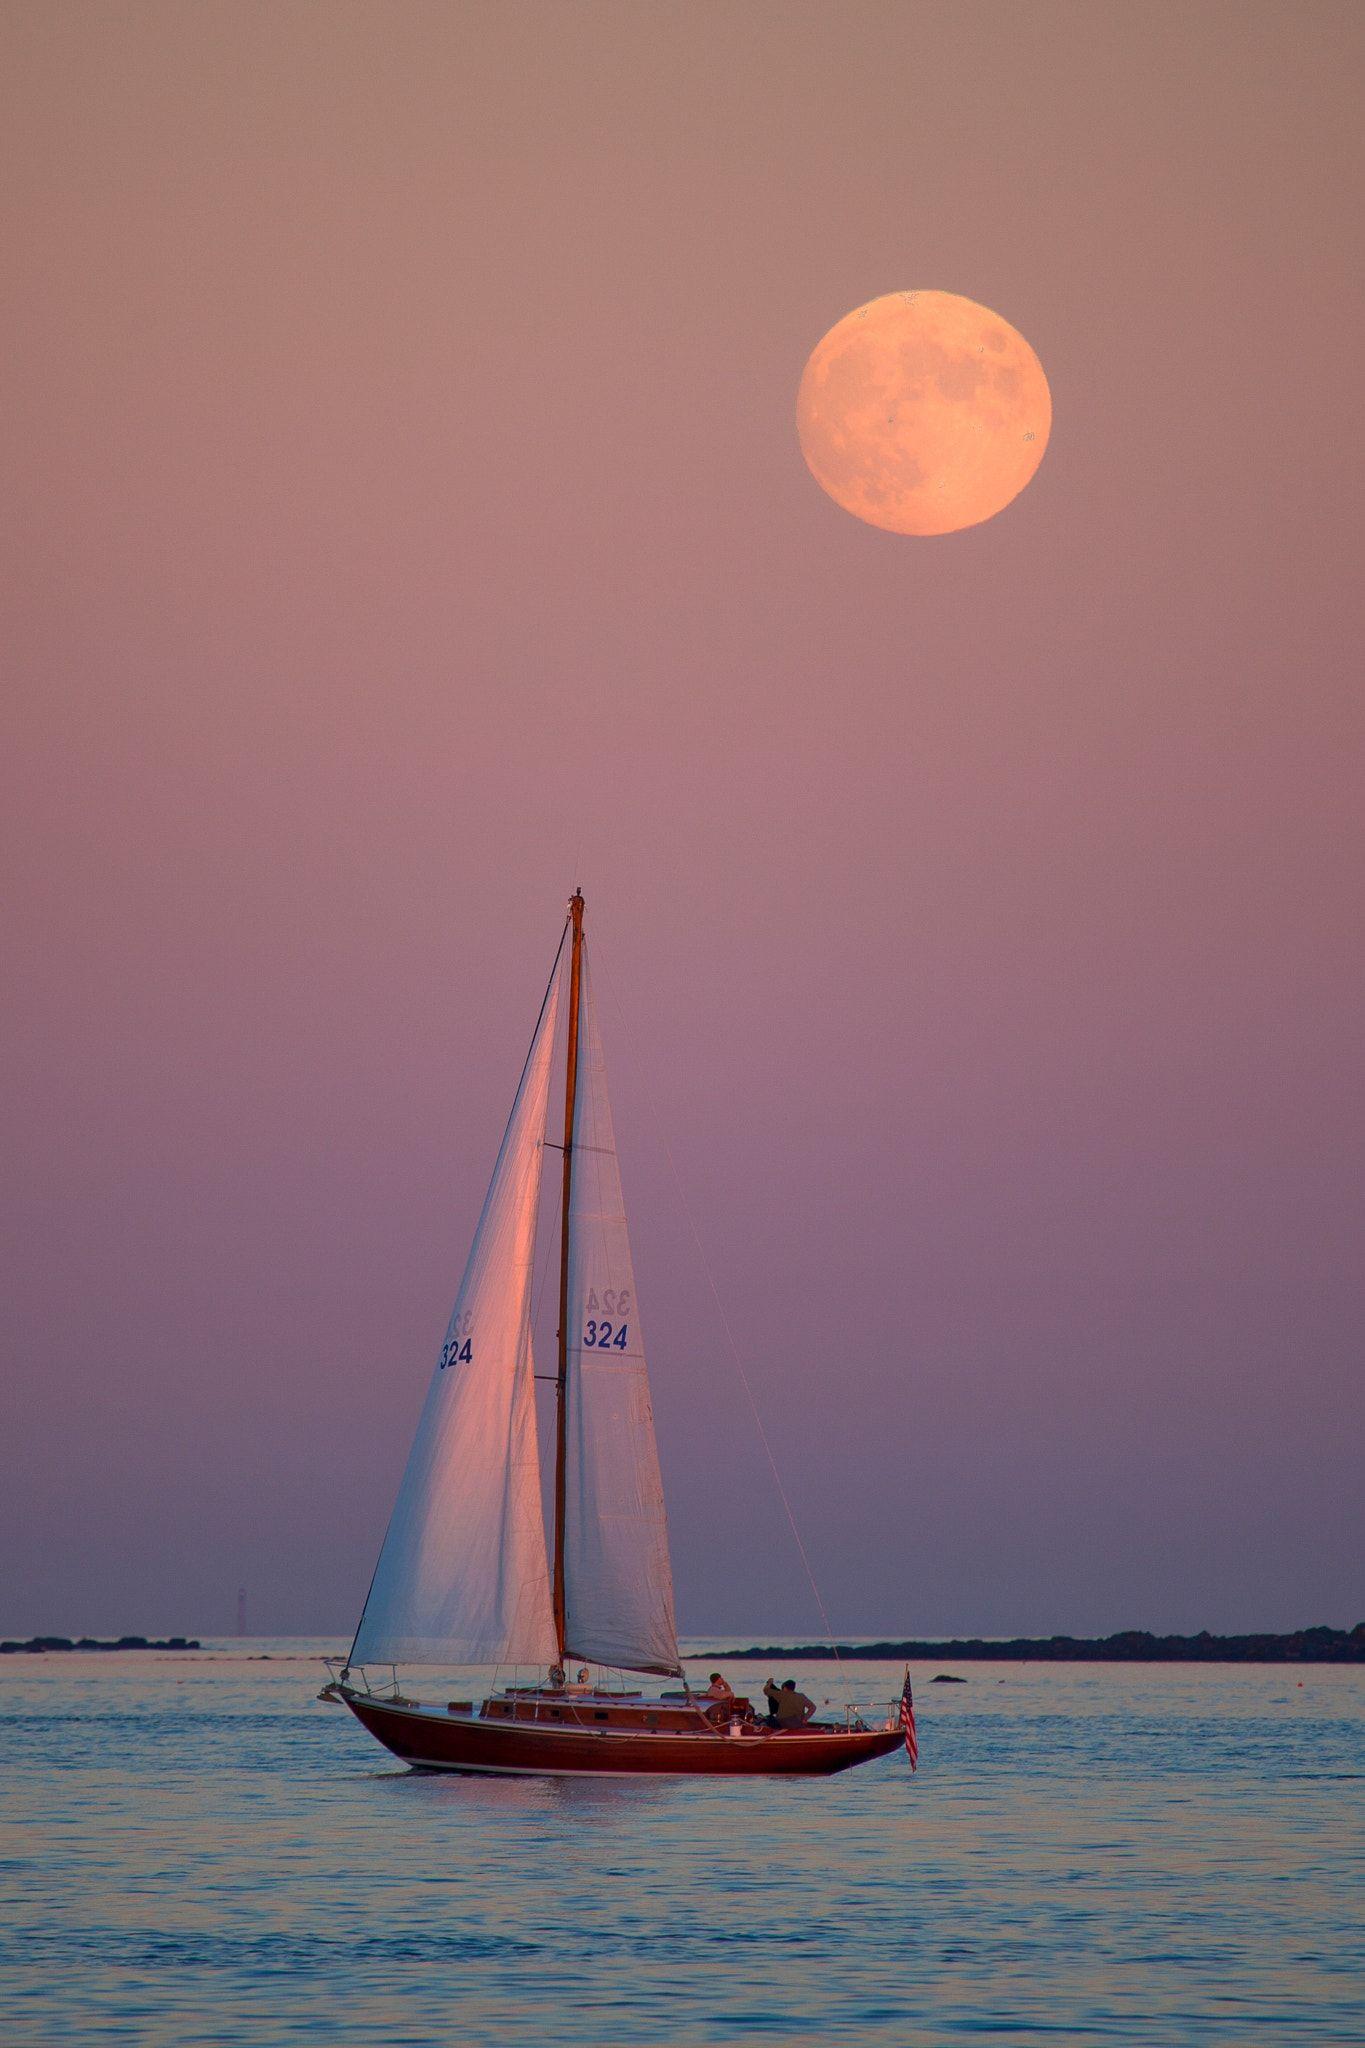 Sunset Sailboat A Full Moon Rises Behind A Sailboat The Evening Of November 16 2013 As Seen From New Castle New Hampshire Boat Sailing Sailboat Moon boat sunset sail evening lake